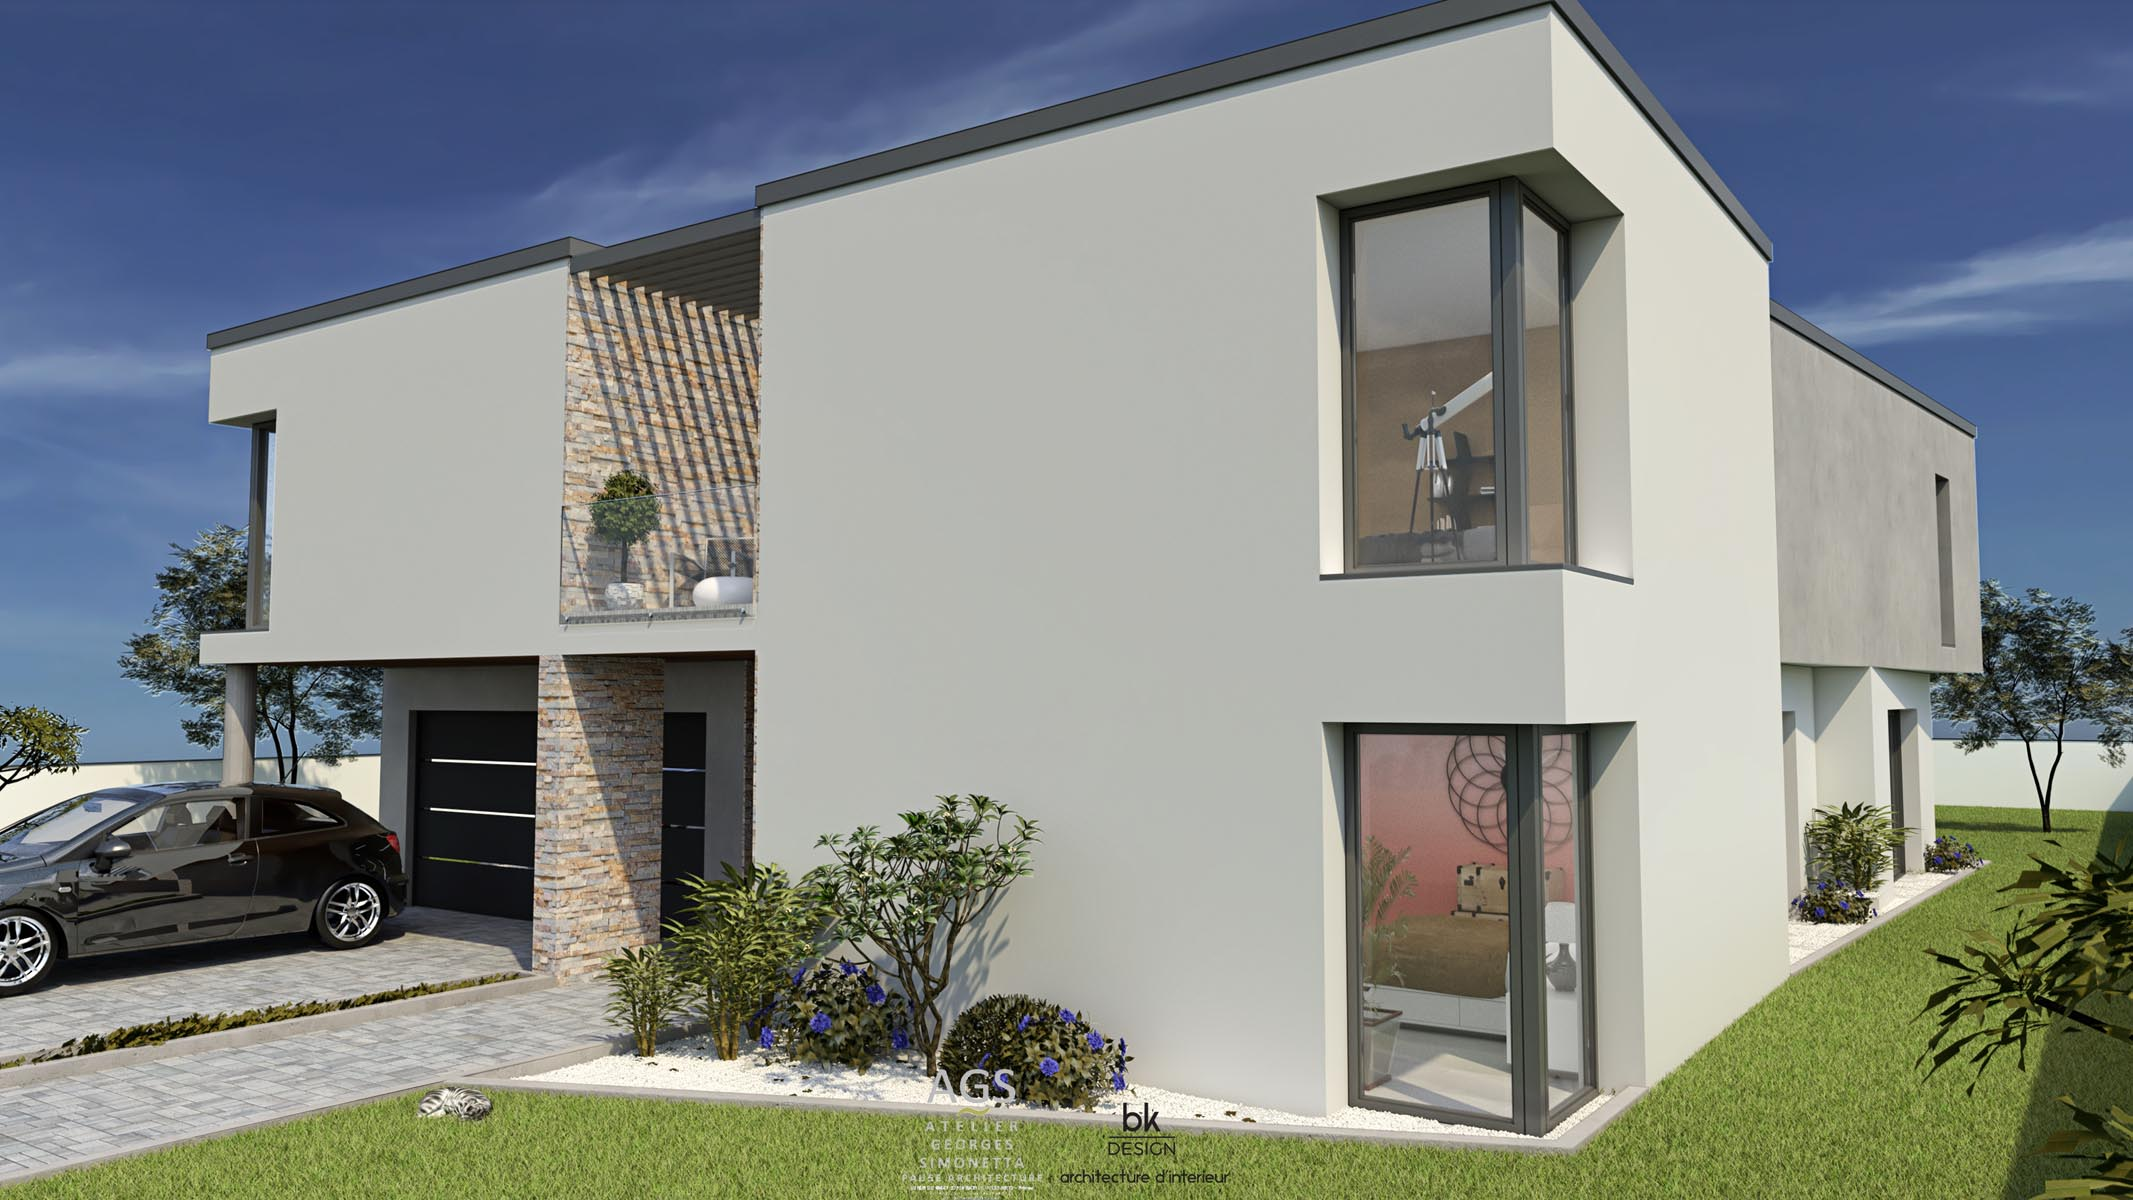 41 bk Design Projet Woippy Maison 105